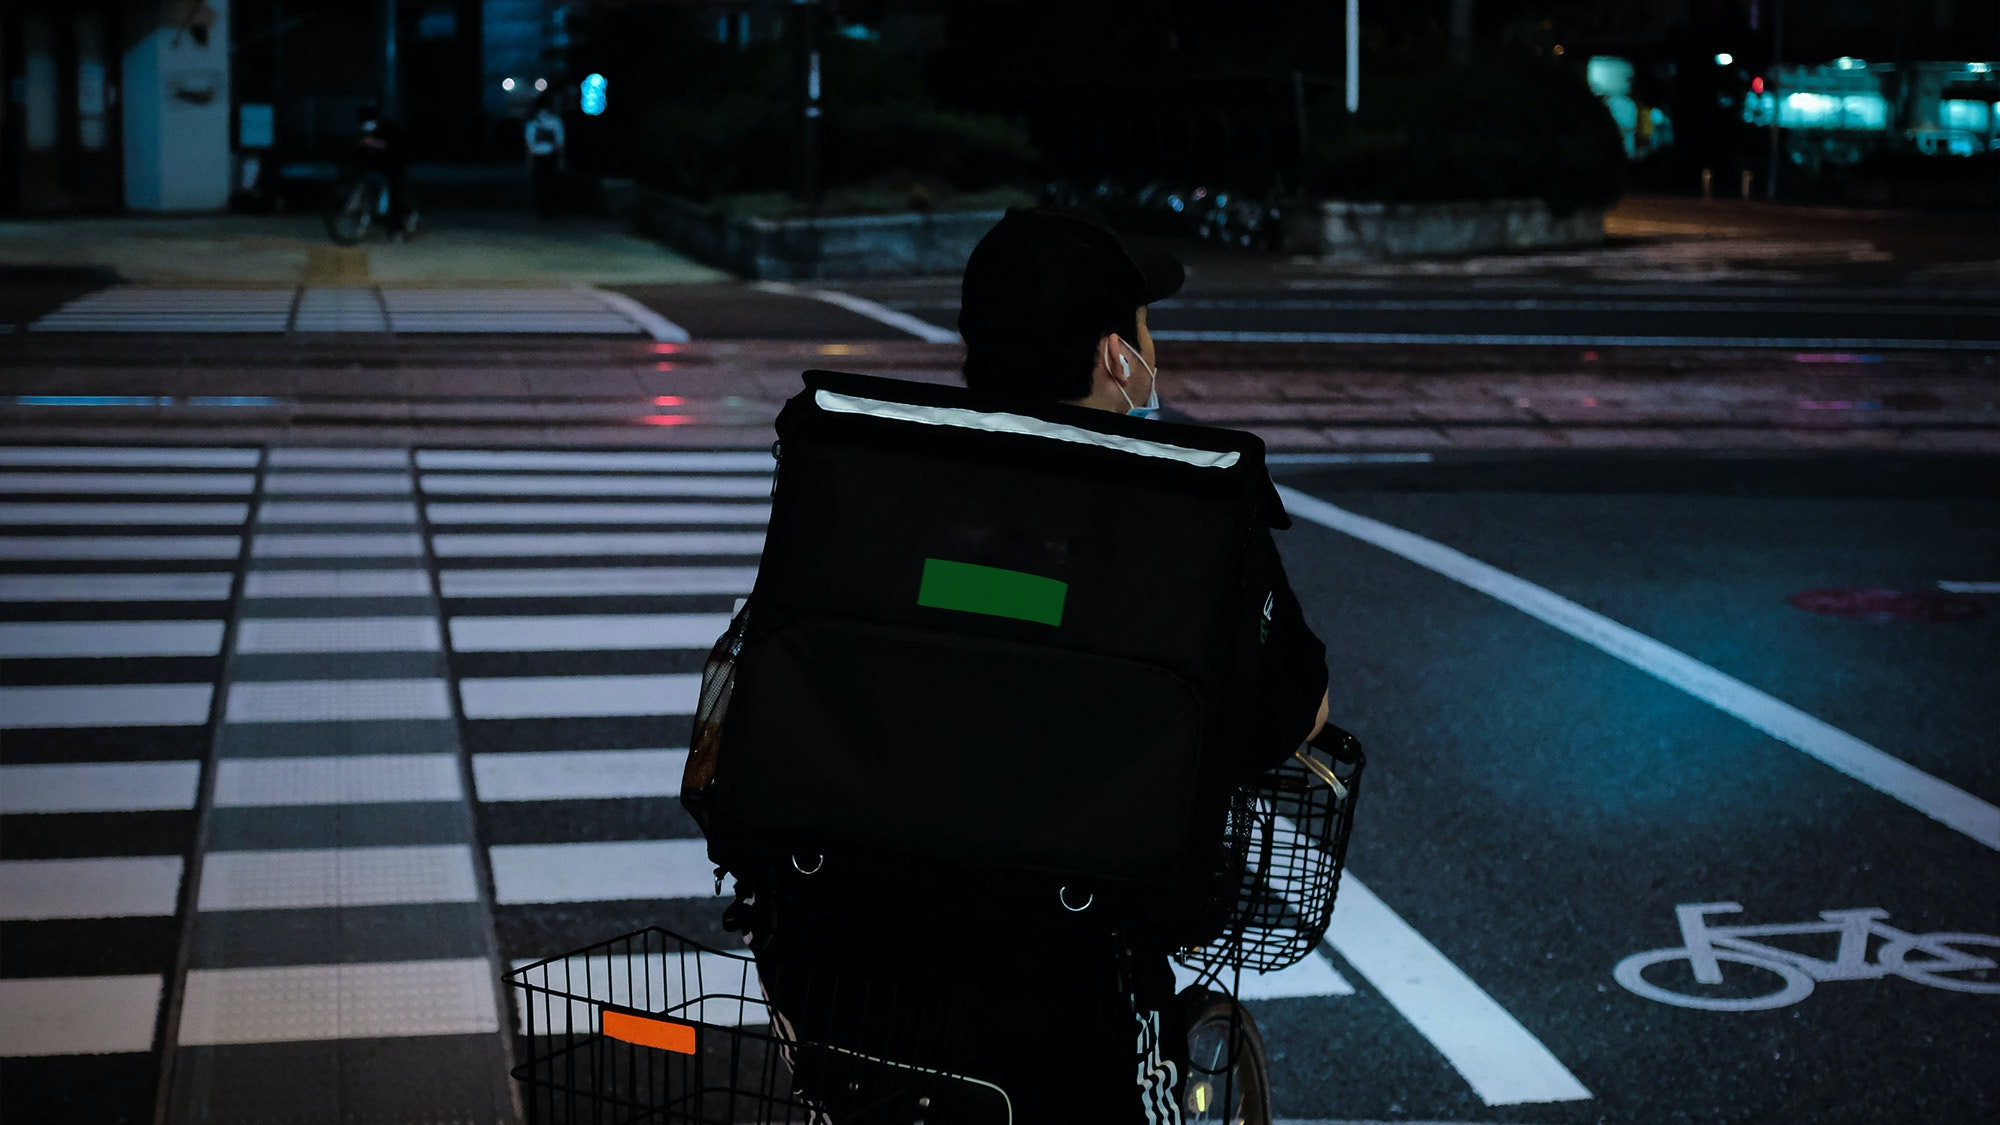 Livreur à vélo Uber